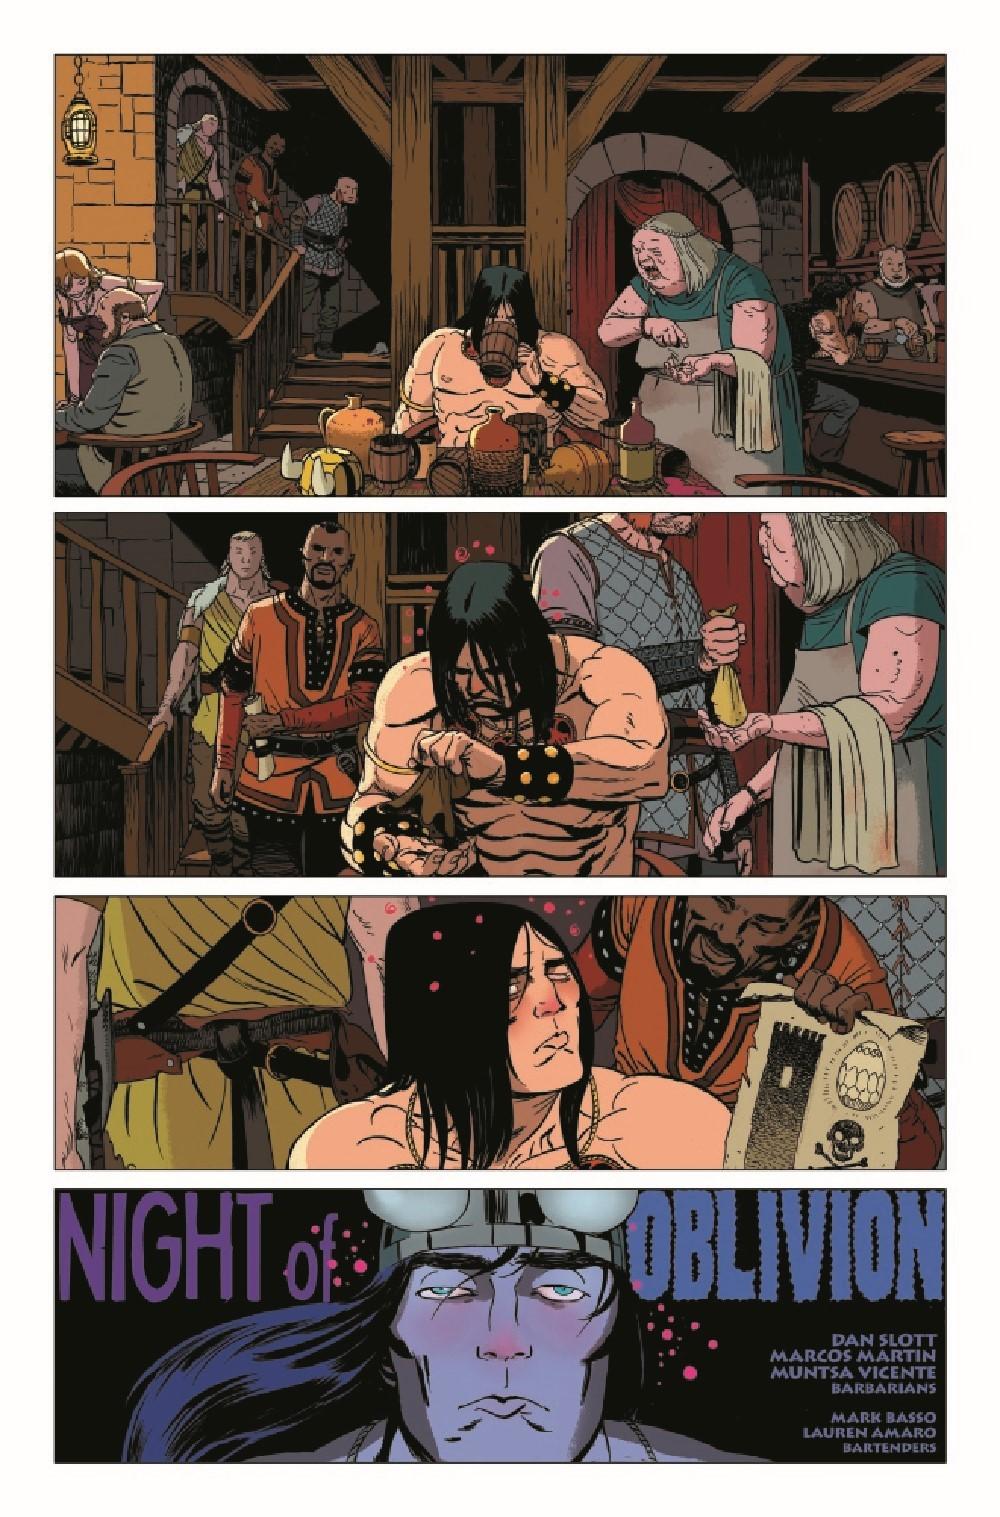 CONANBARB2019025_Preview-6 ComicList Previews: CONAN THE BARBARIAN #25